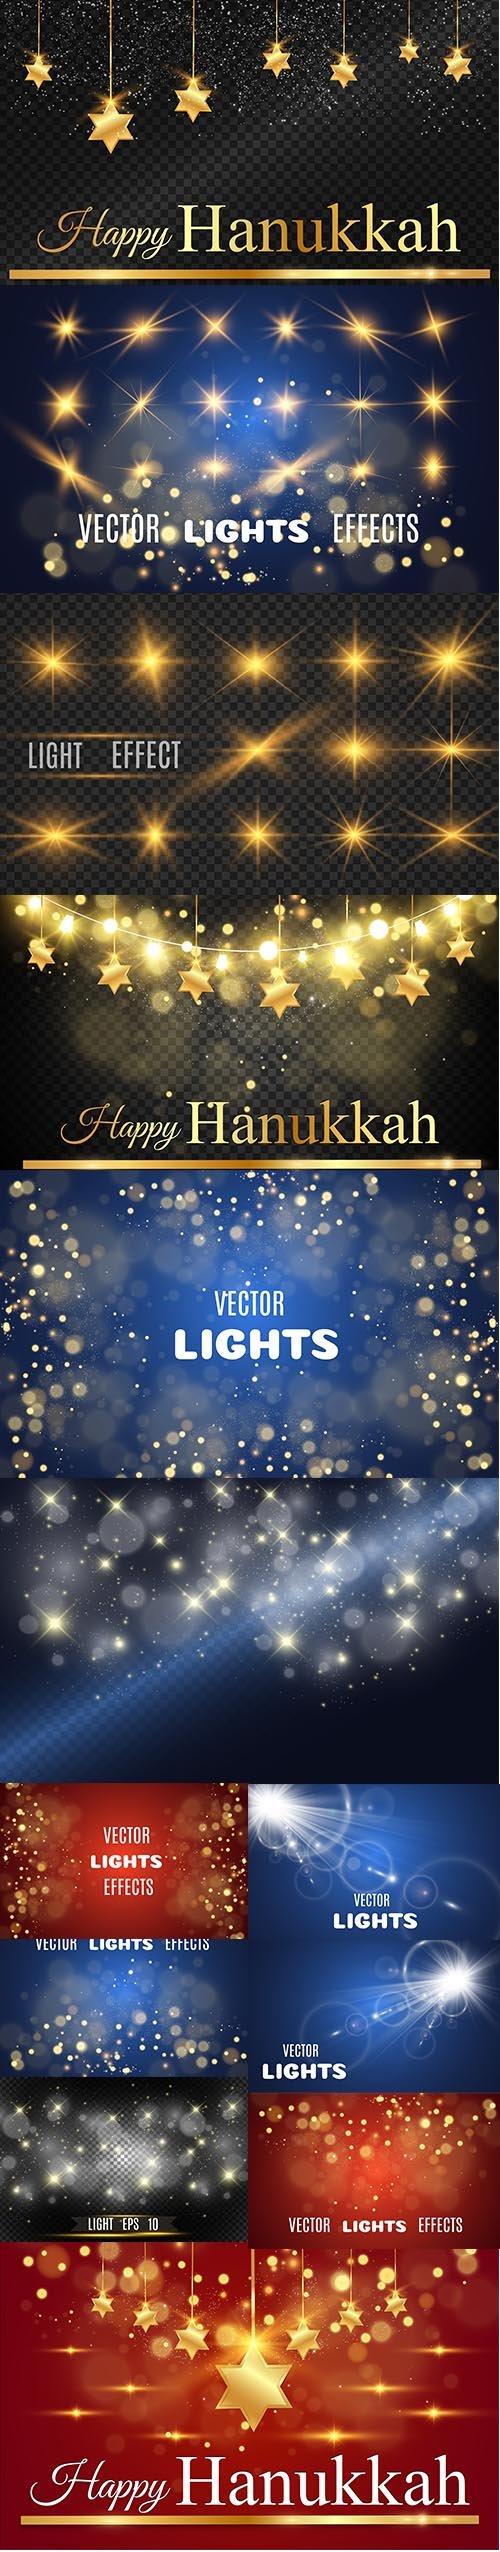 Hanukkah Background with Stars David and Bright Beautiful Stars Light